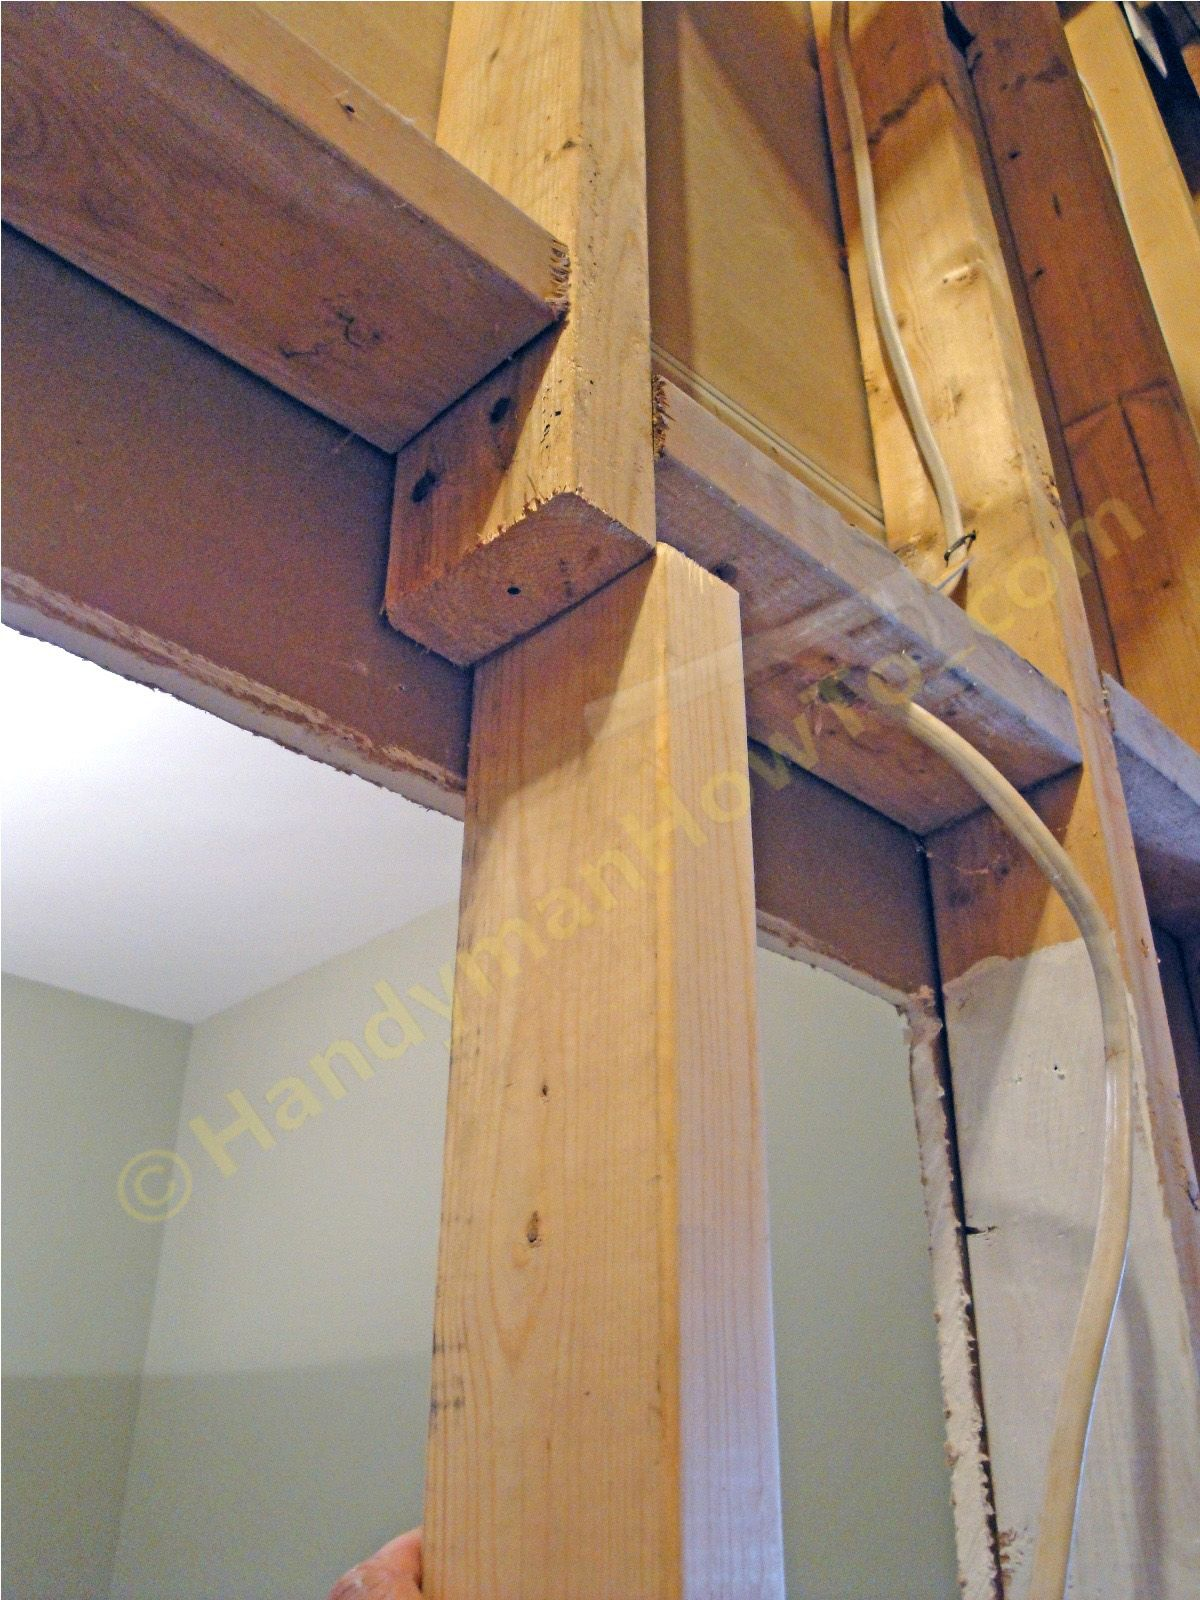 Load Bearing Wall Stud Repair Mark The 2x4 Splice Stud